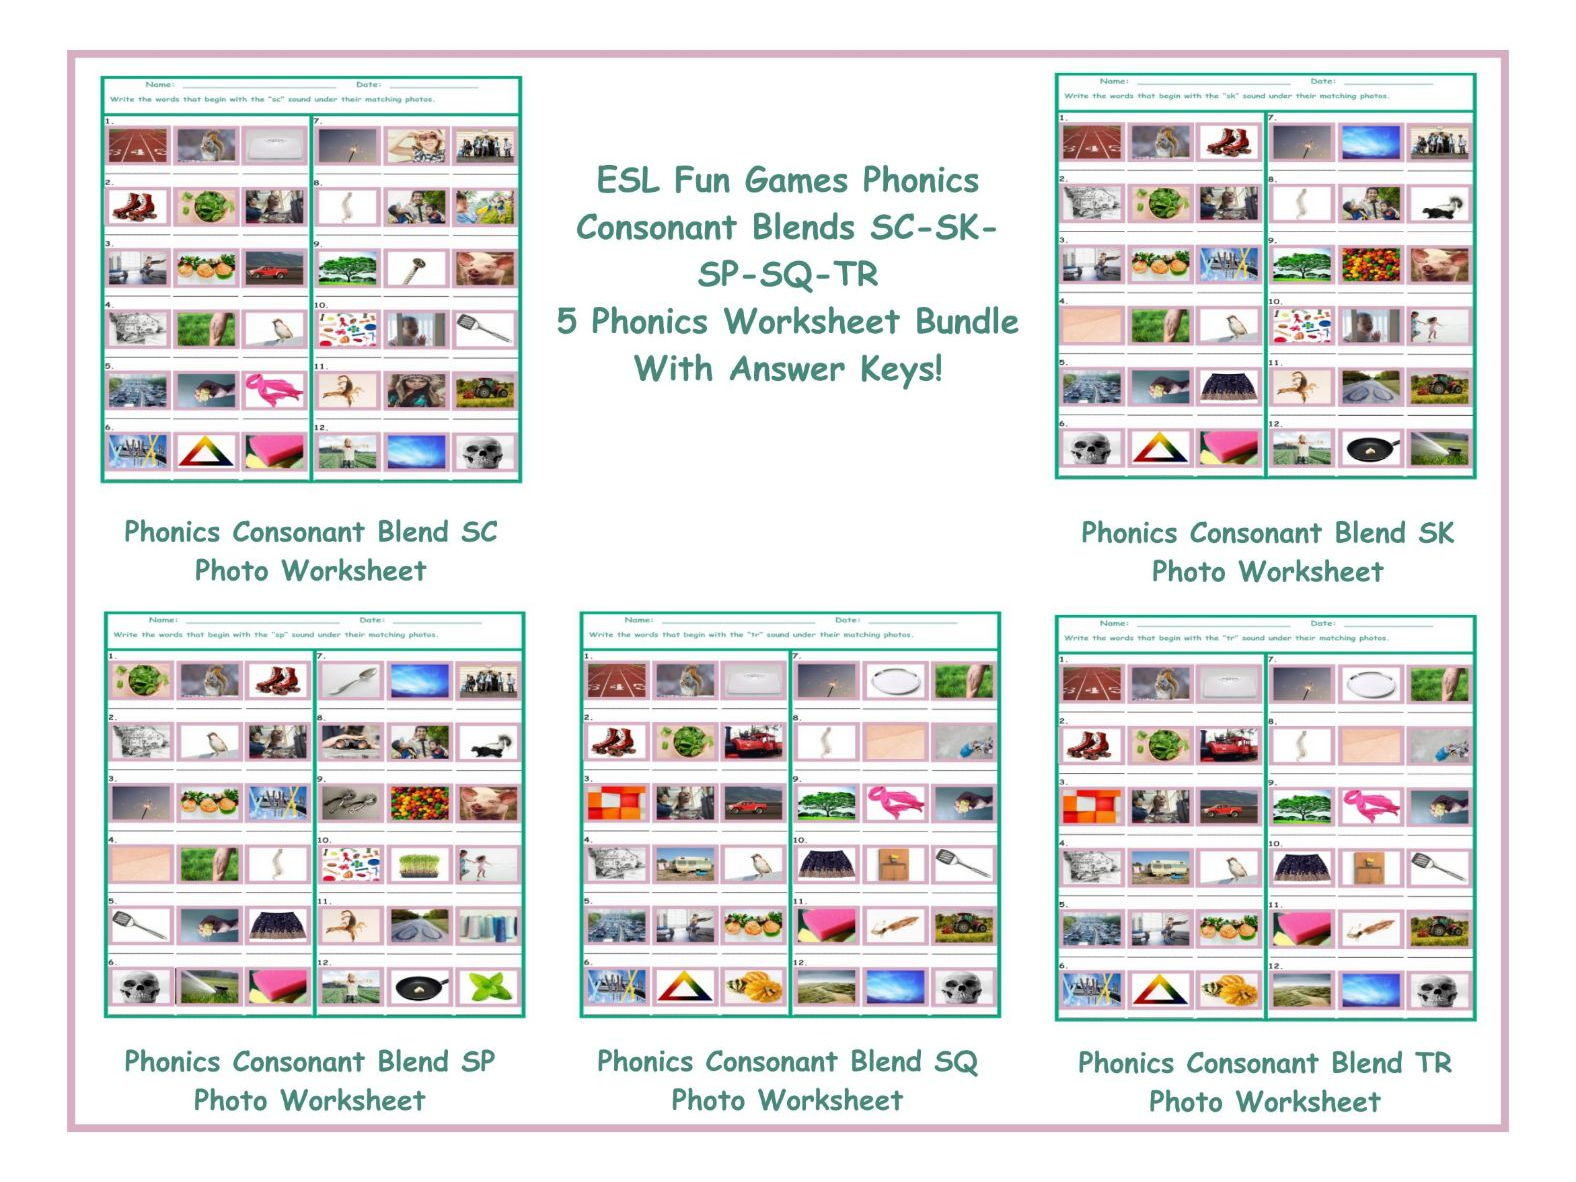 worksheet Consonant Blend Worksheets phonics consonant blends sc sk sp sq tr 5 worksheet bundle by eslfungames teaching resources tes